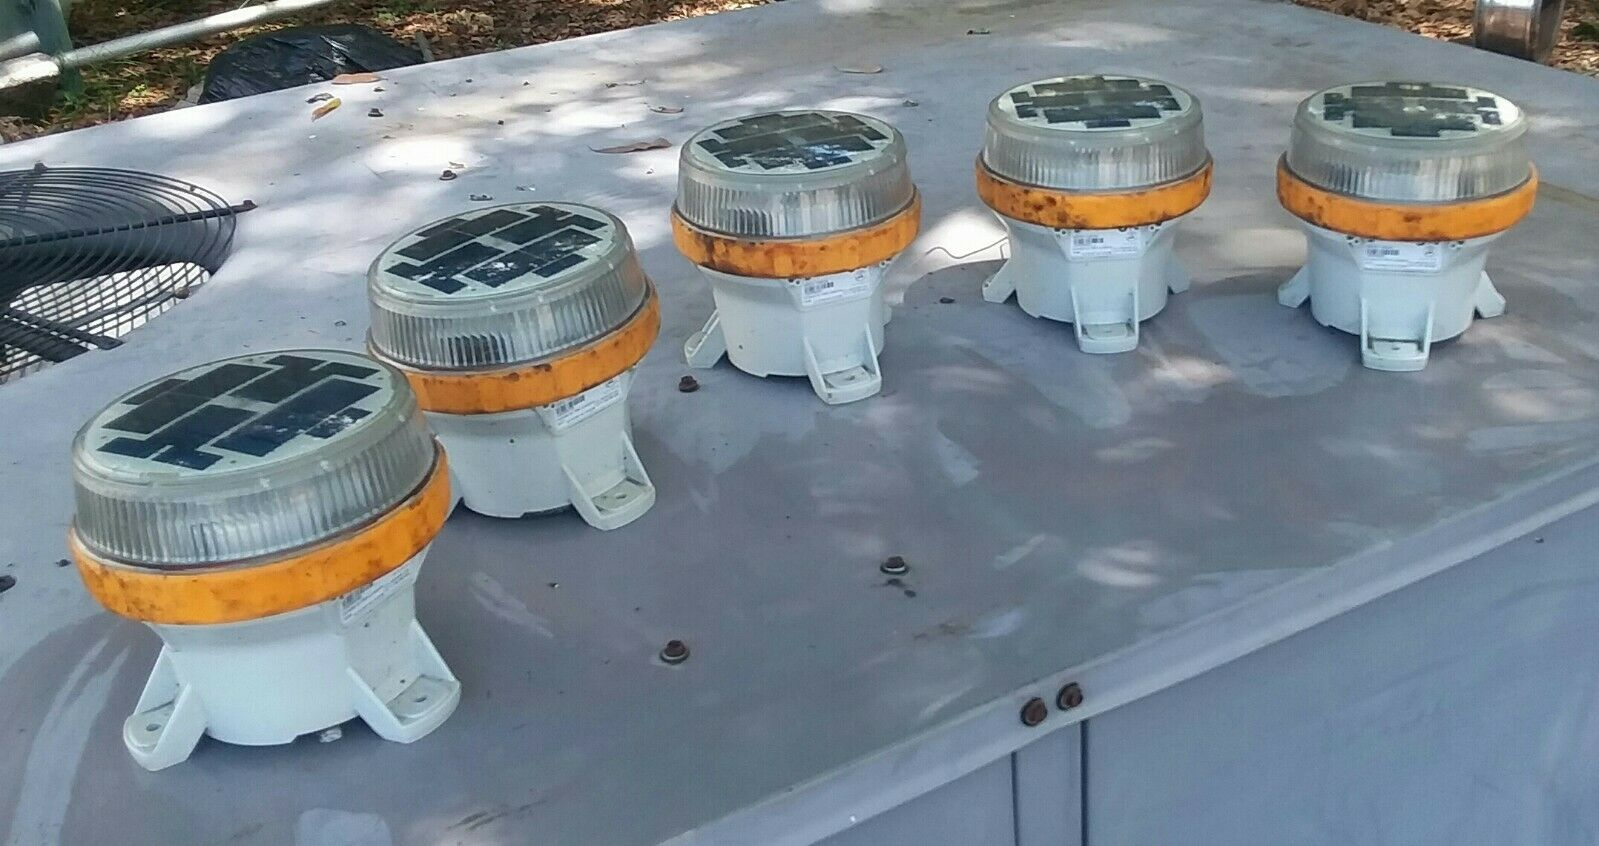 LOT OF 5 Carmanah M650 Gelb Solar LED Marine Navigational Lights w o BATTERIES